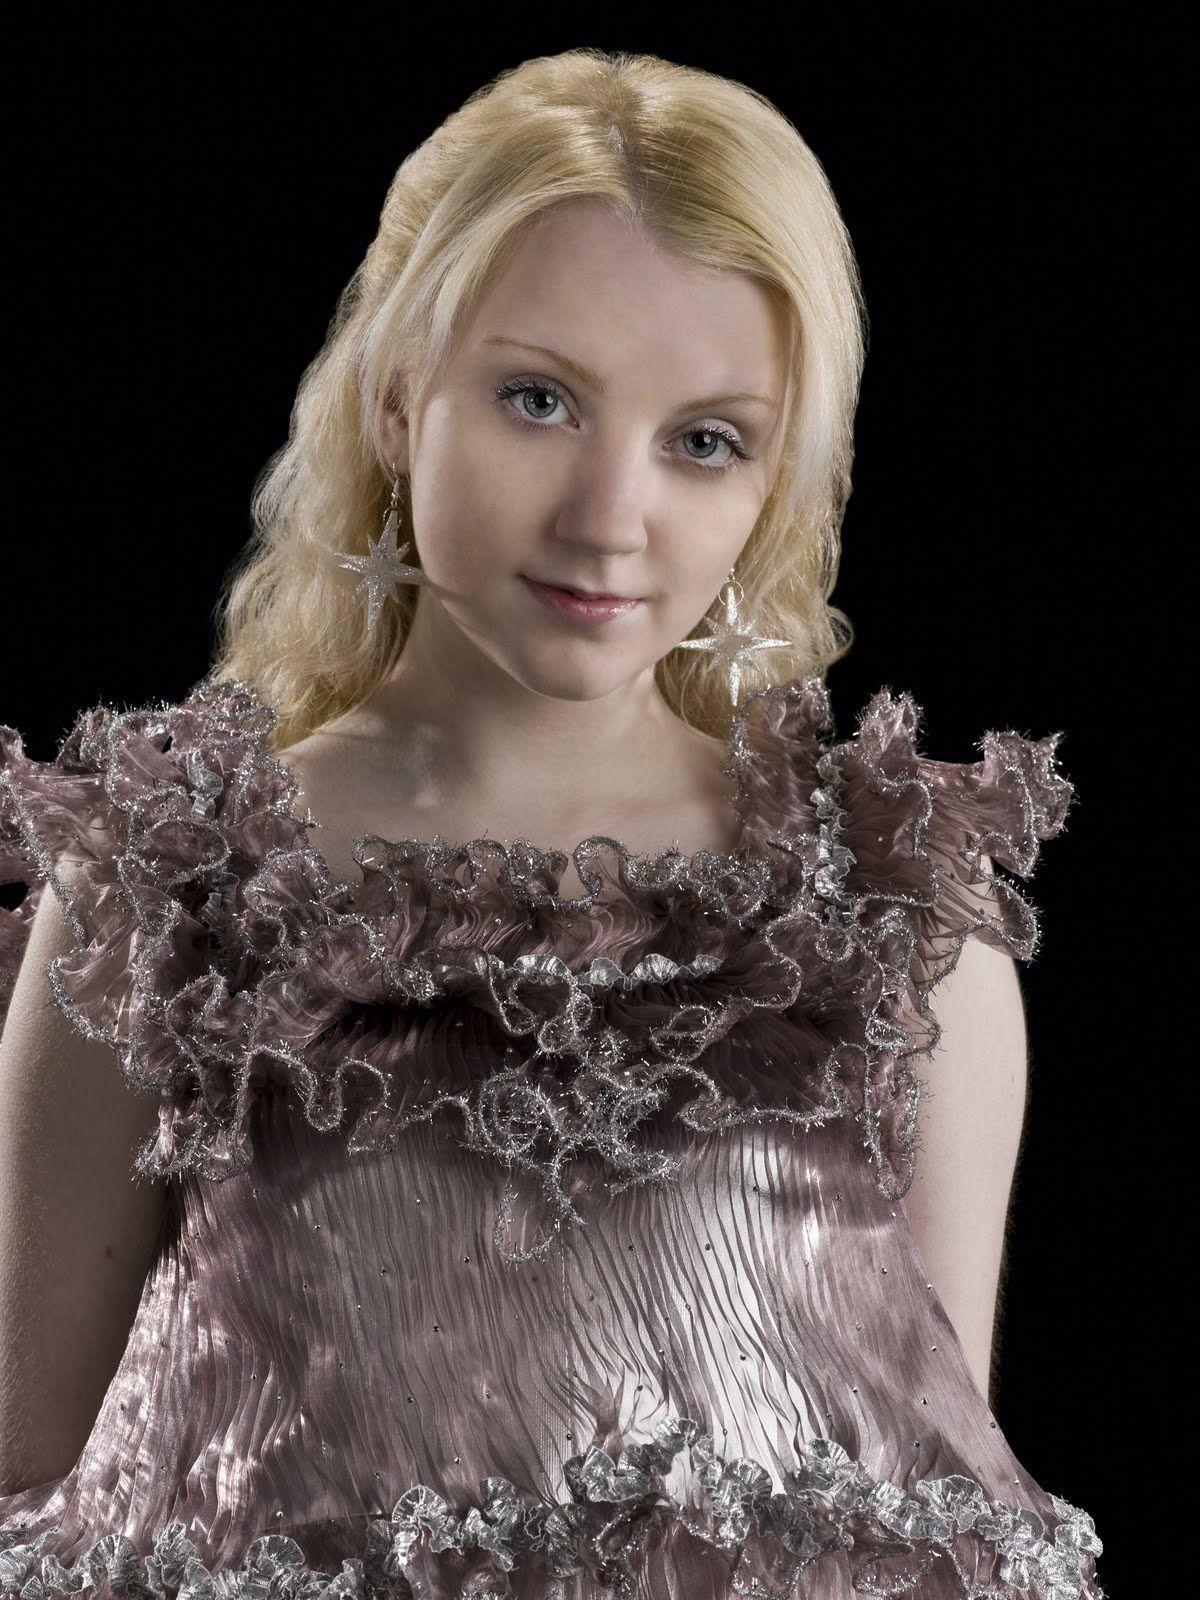 Luna Lovegood Slughorn S Christmas Party Dress And Earrings Luna Lovegood Dress Harry Potter Luna Lovegood Luna Lovegood